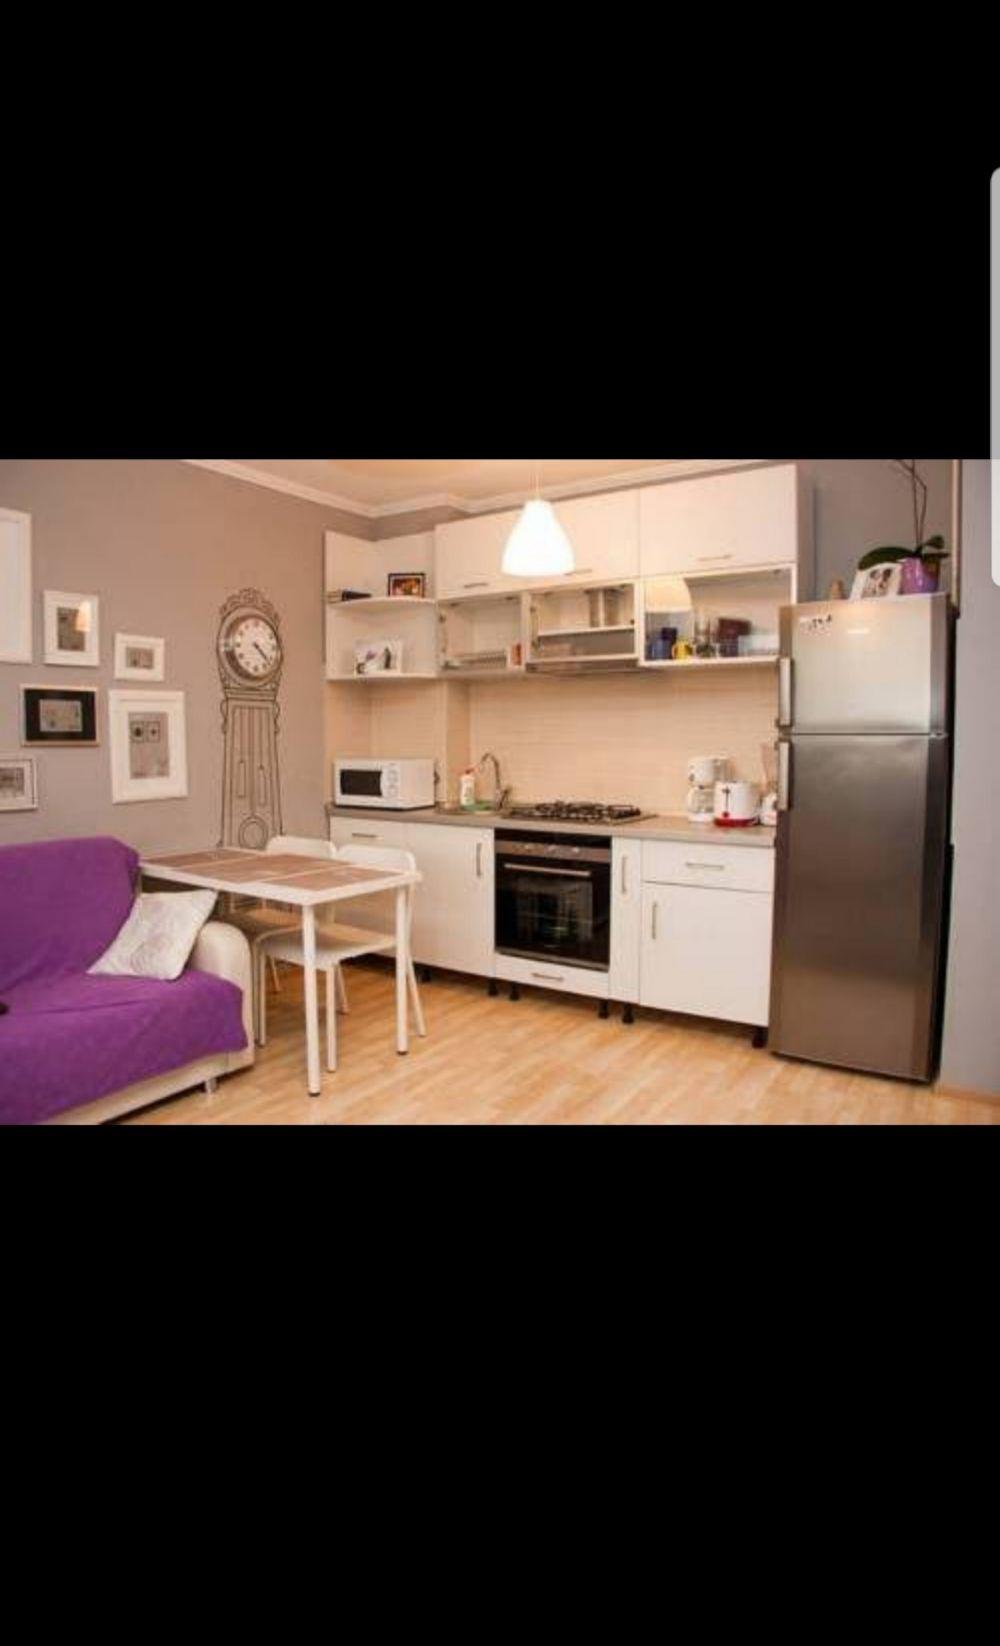 Regim hotelier ap 3 camere in Avantgarden 2 - imagine 12